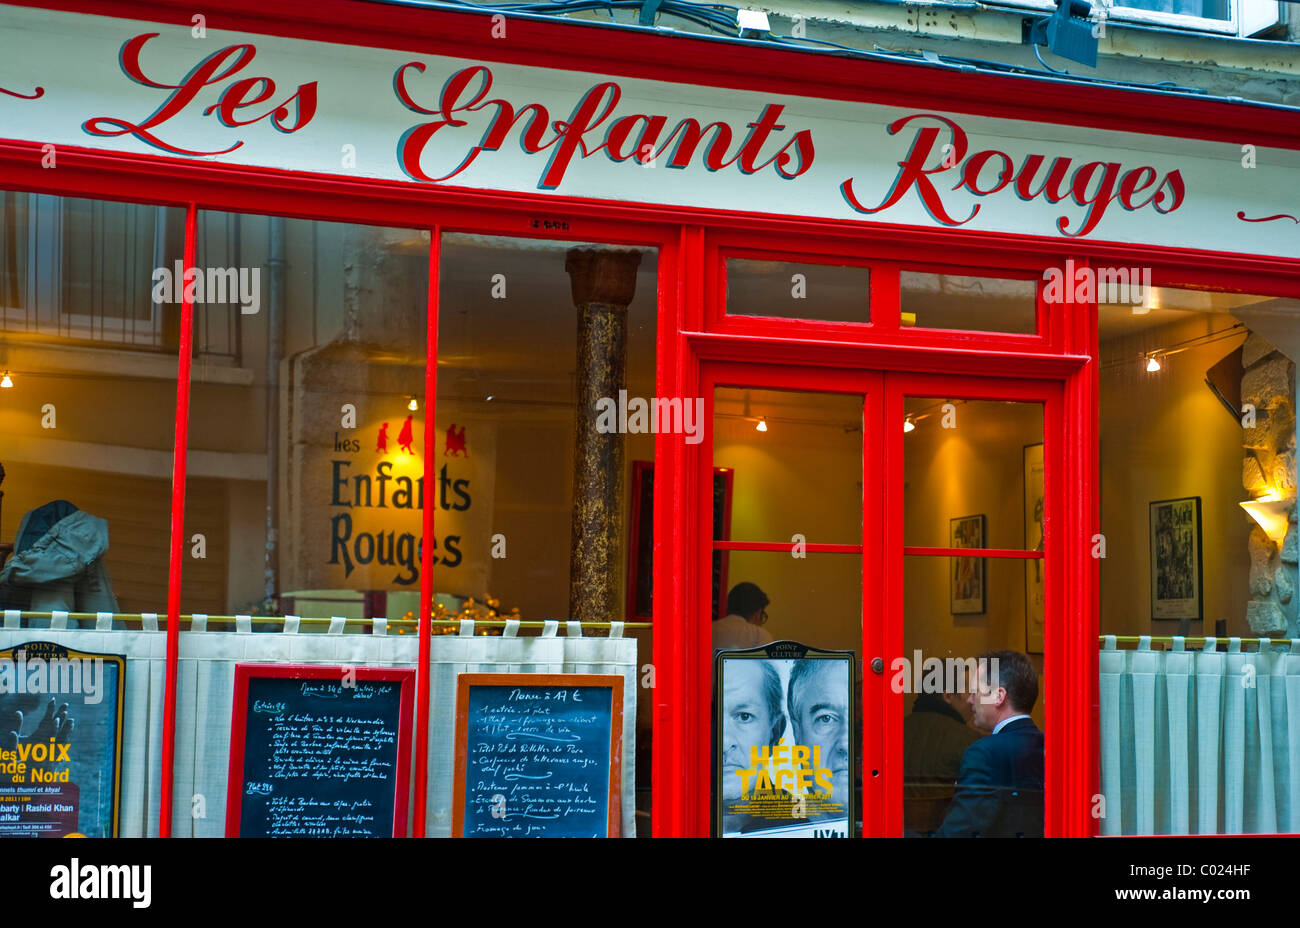 Paris, France, French Bistro Restaurant, 'Les Enfants Rouges' old Storefront, in the Marais District, - Stock Image